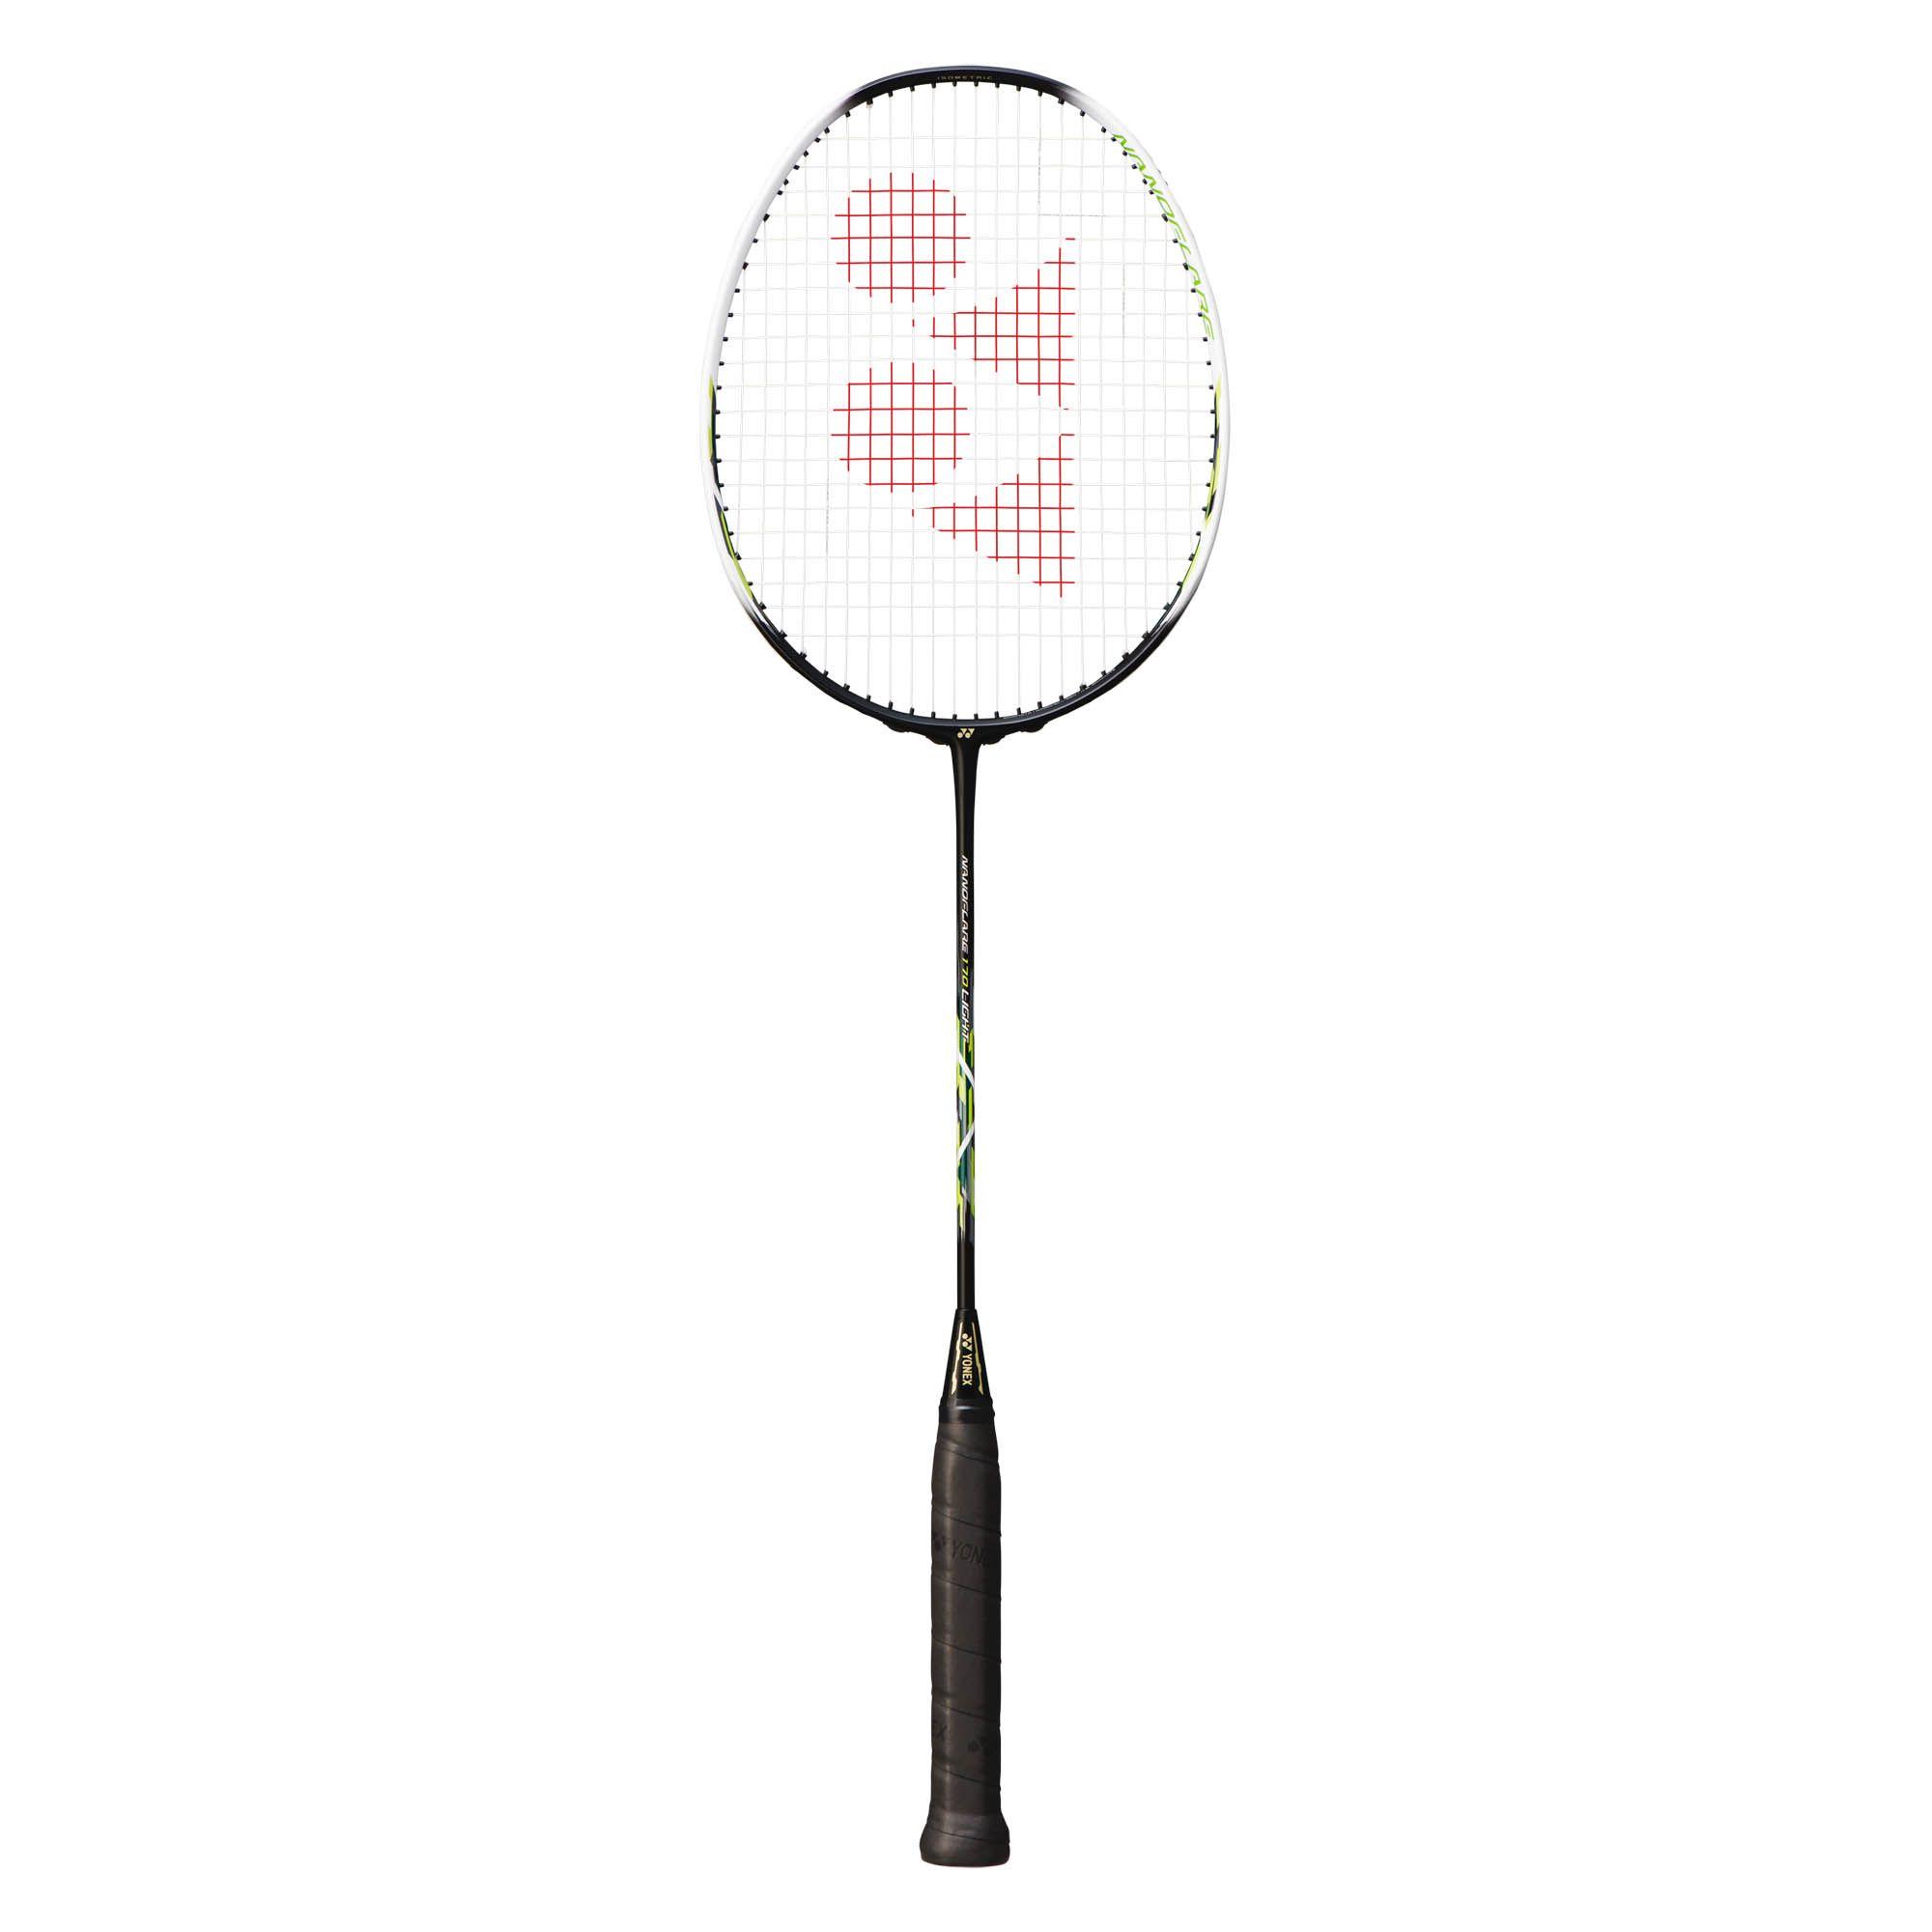 Yonex Nanoflare 170 Light Badminton Racket - Sweatband.com